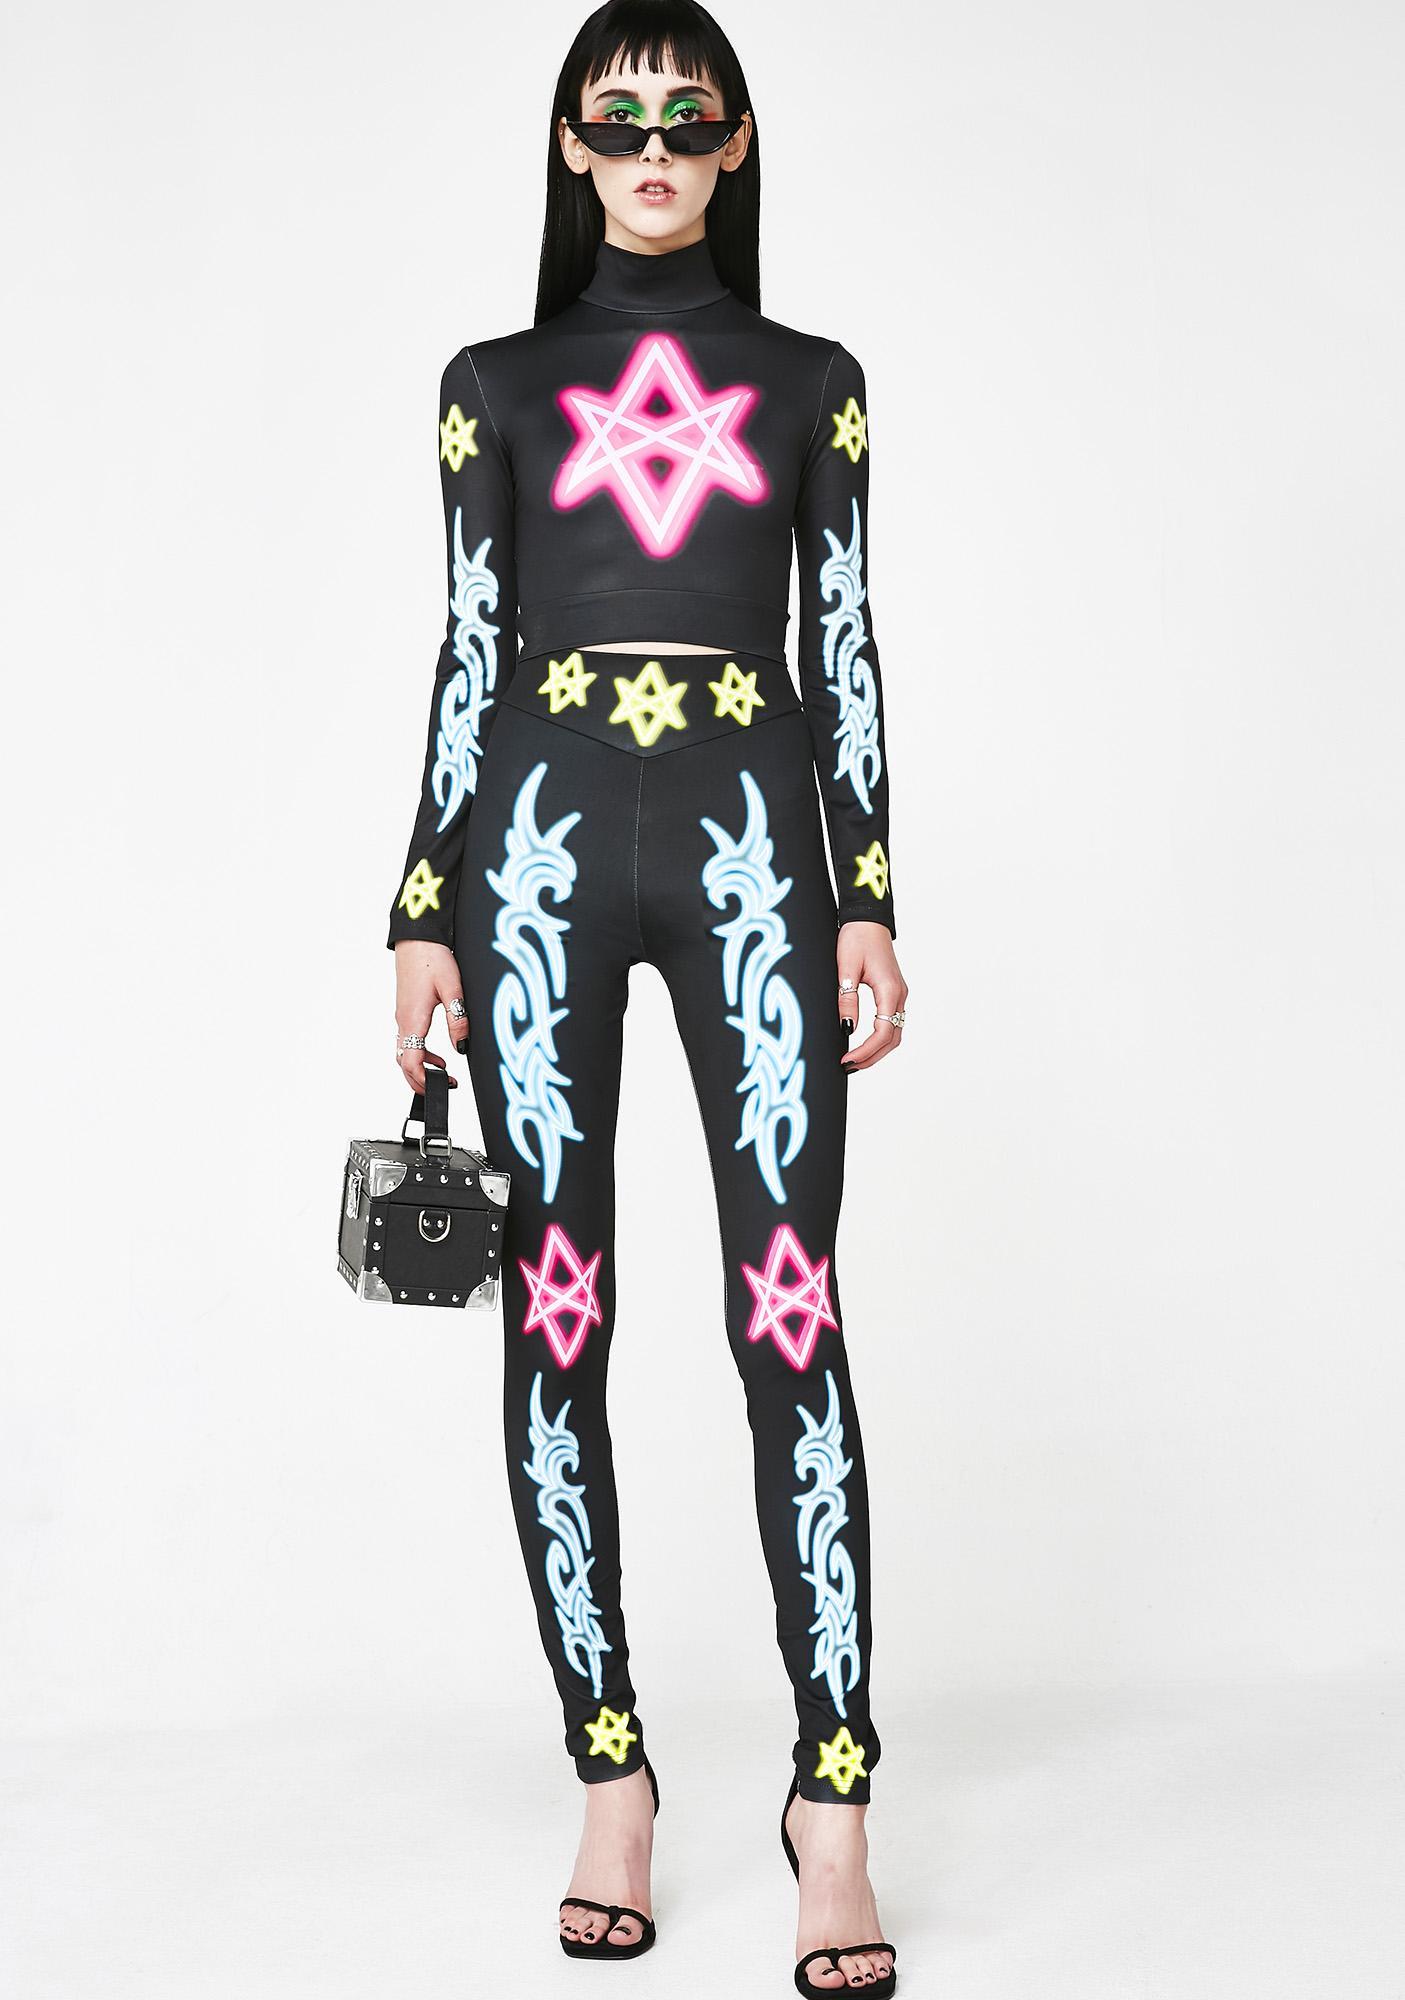 Long Clothing x Nympha Sexagram Leggings